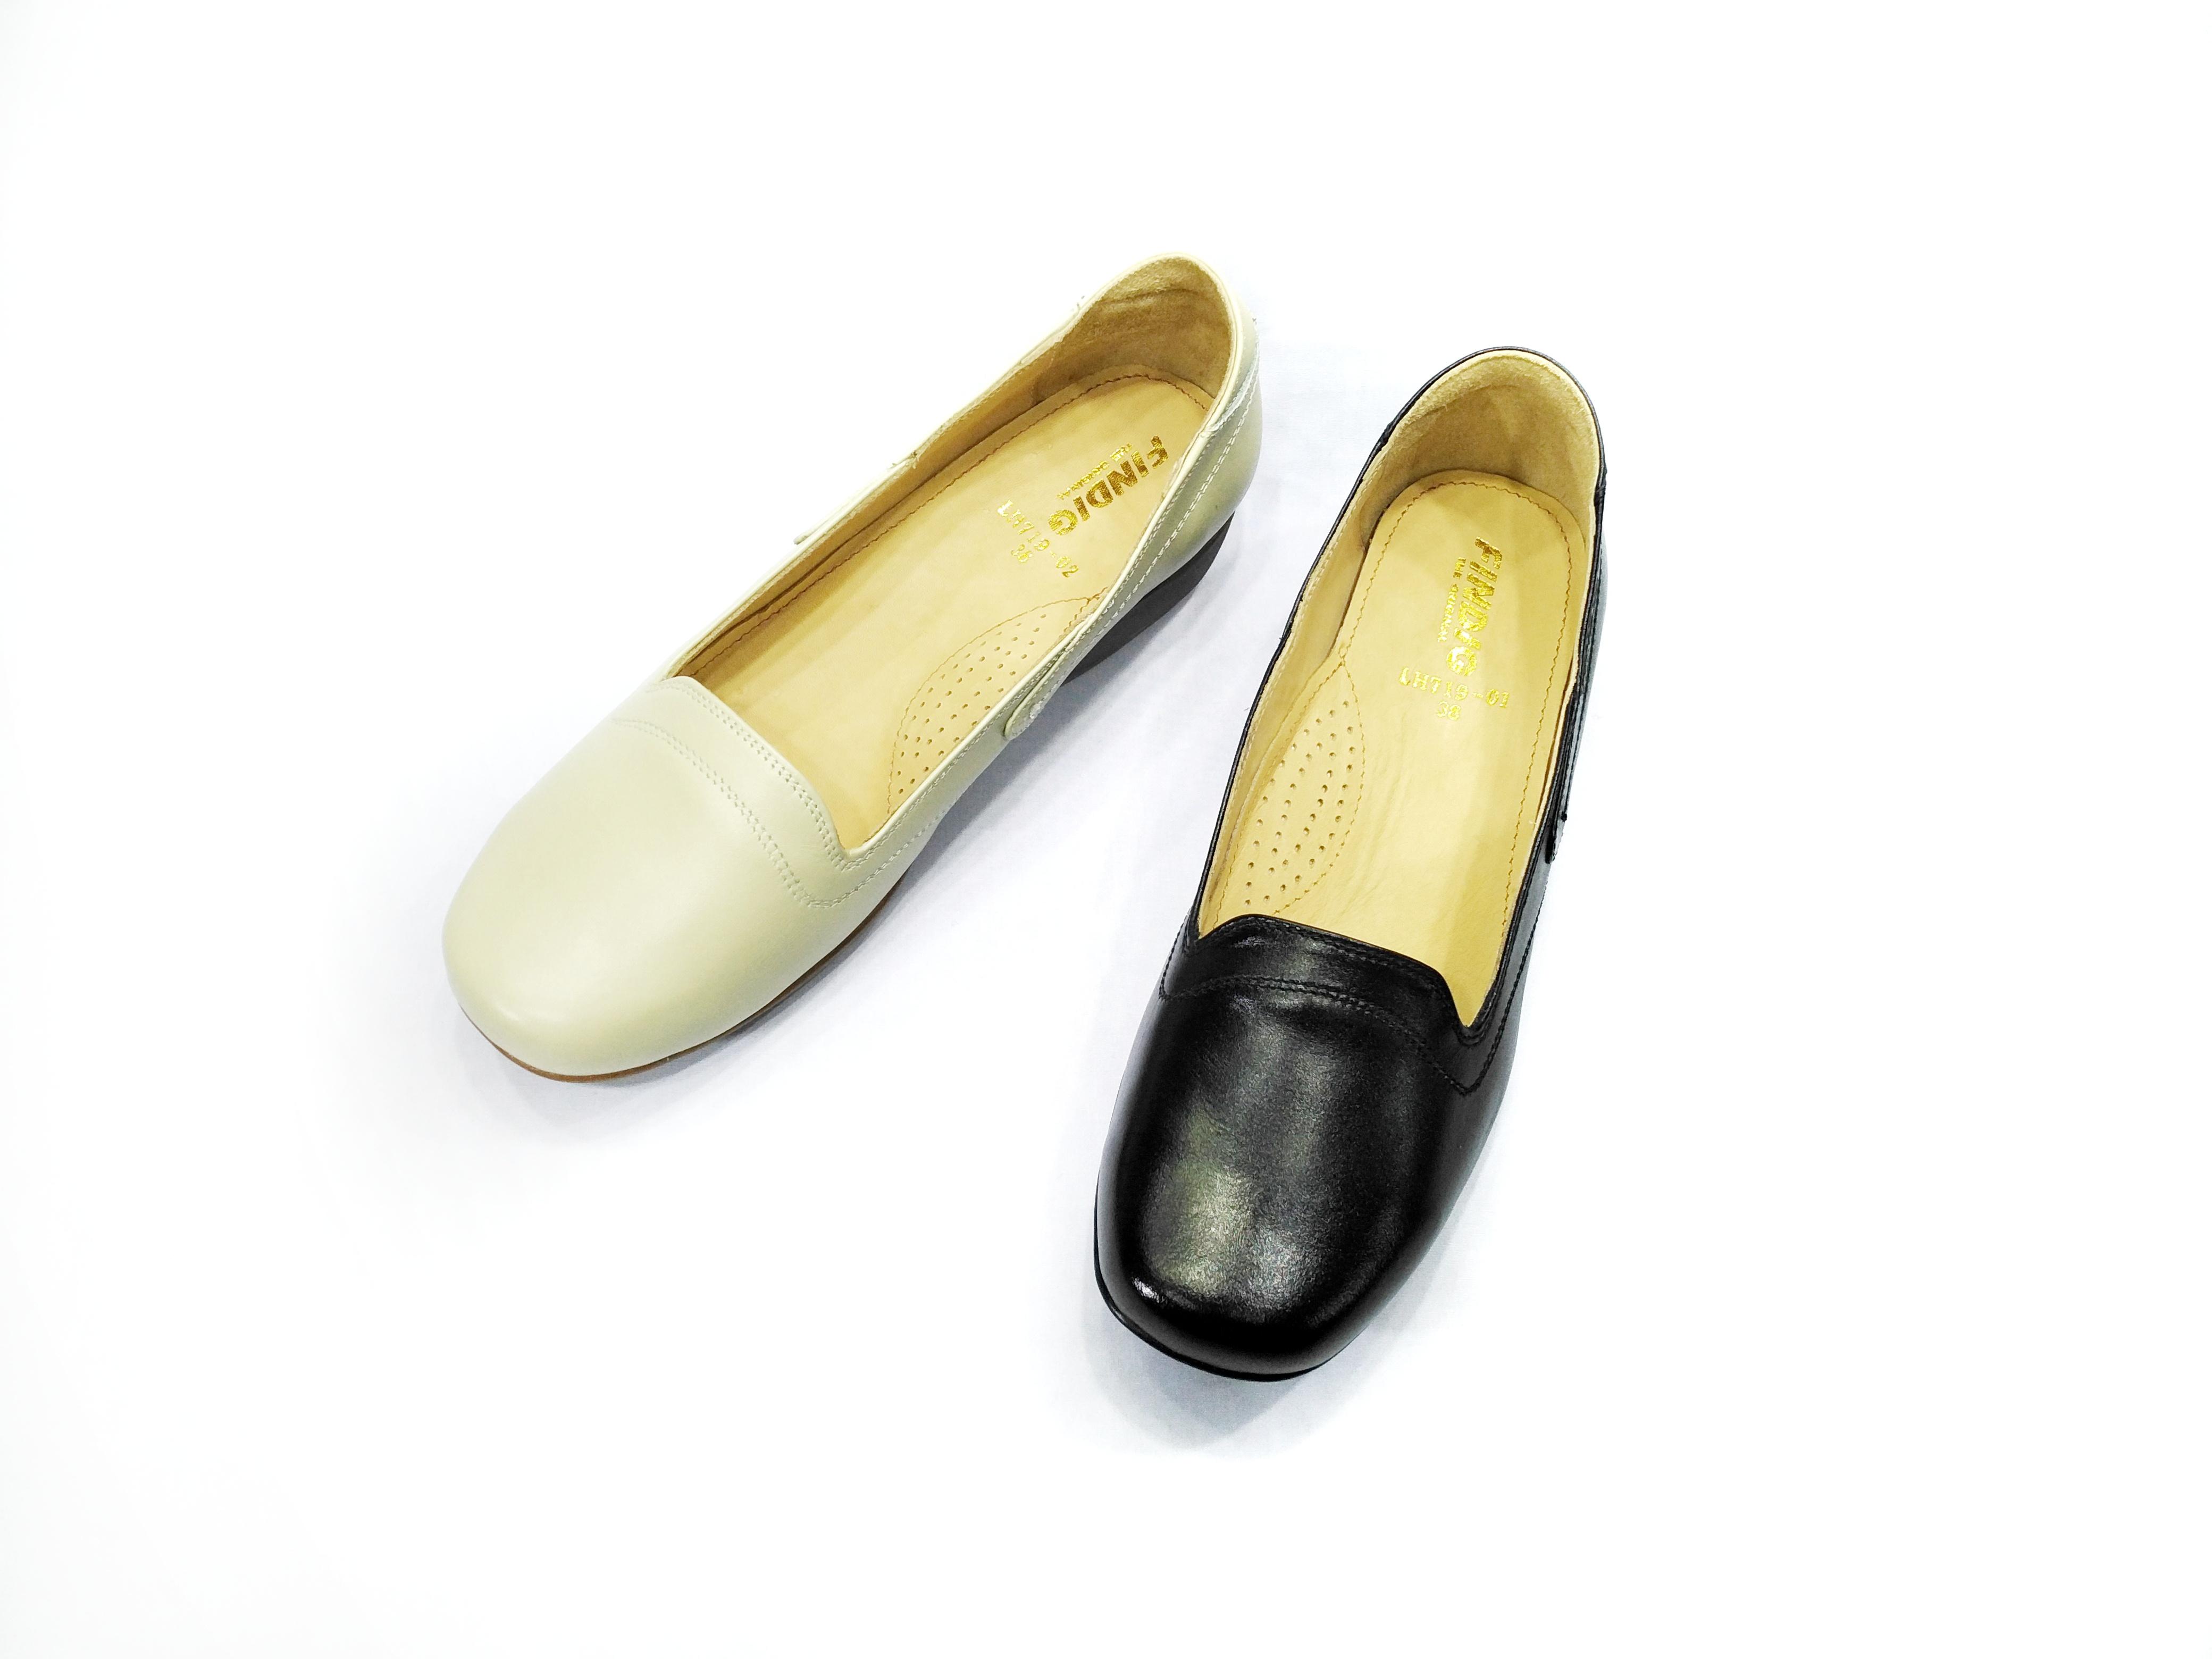 FINDIG รองเท้าสตรี รุ่น LH719